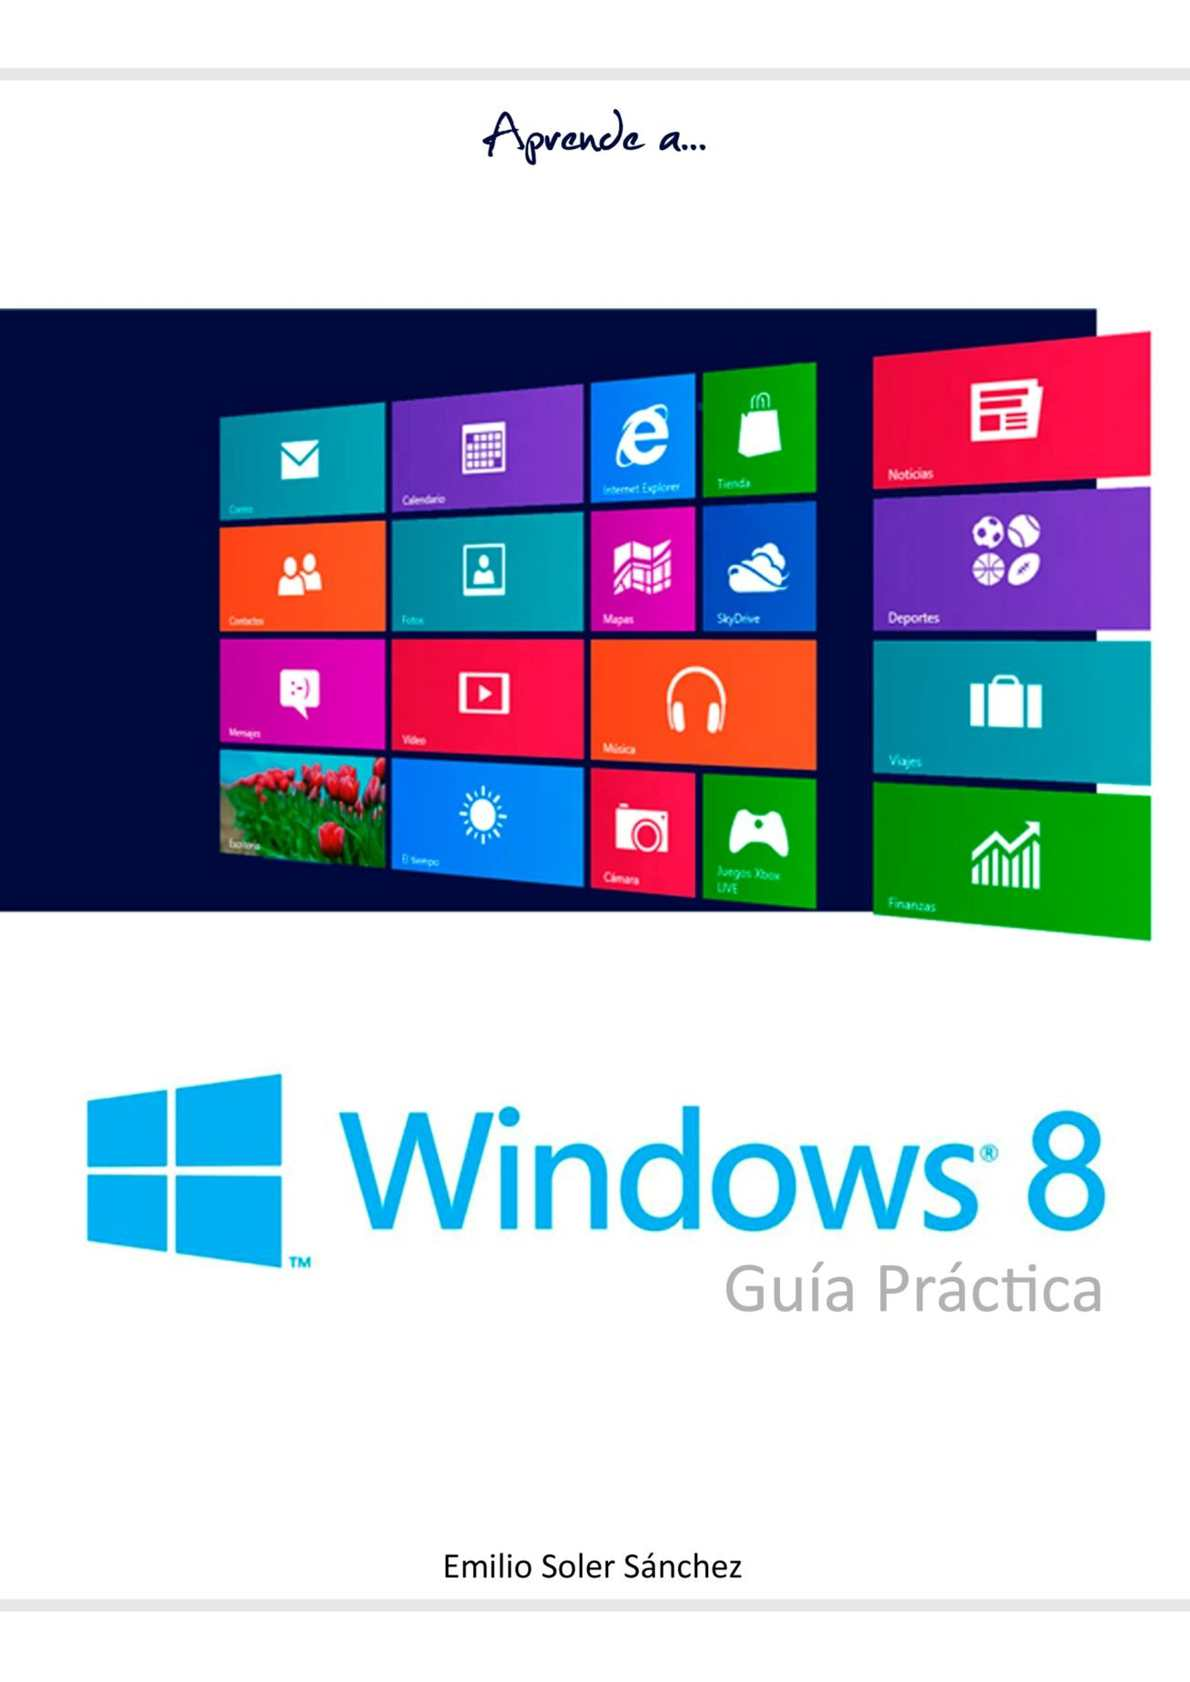 Calaméo - Windows 8 Guia Practica